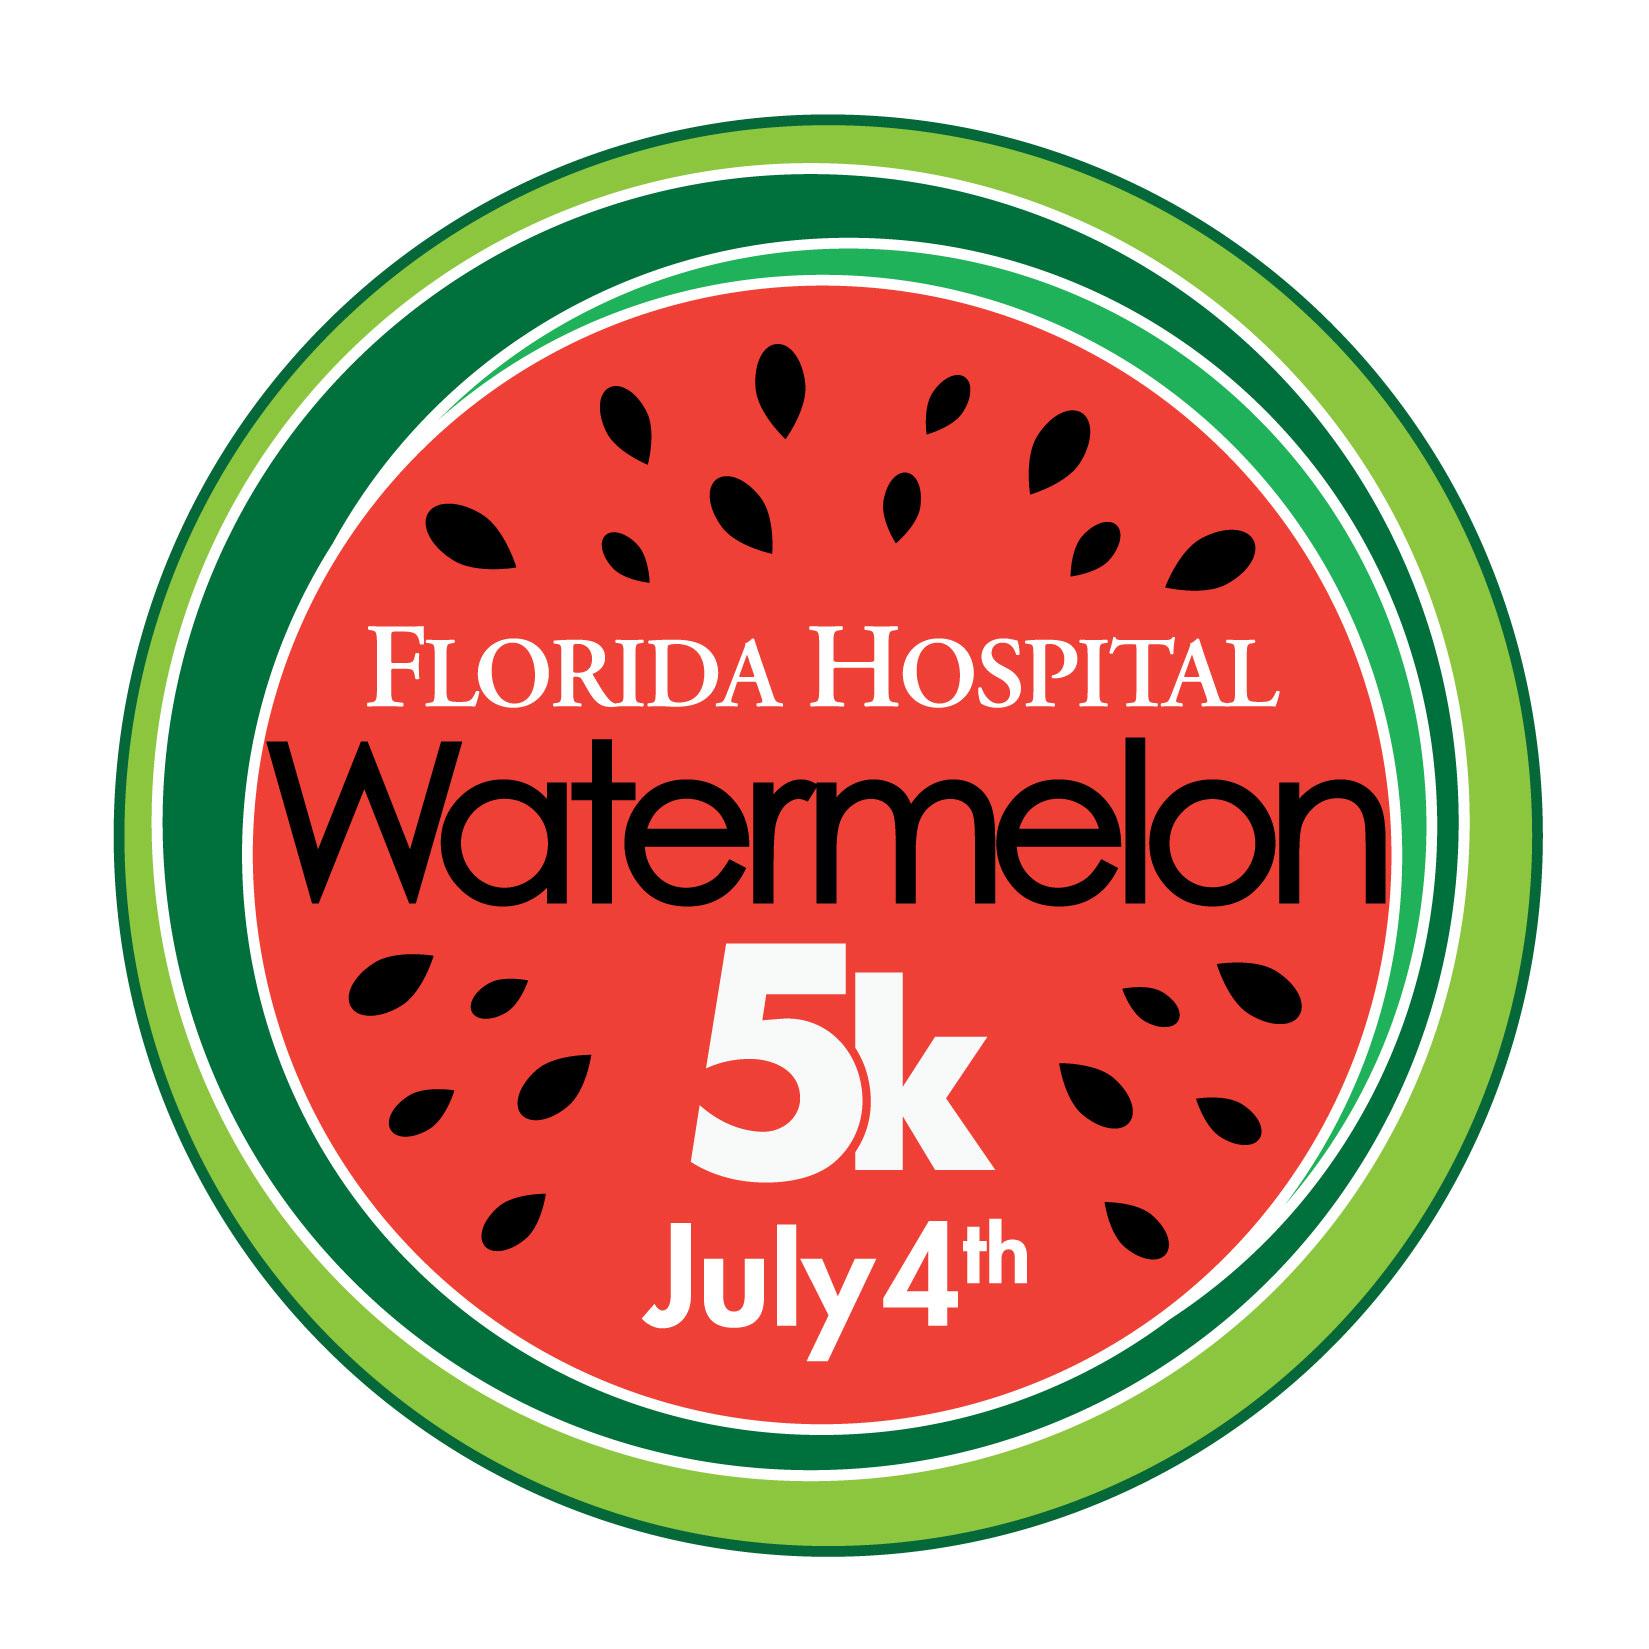 Florida Hospital Watermelon 5k